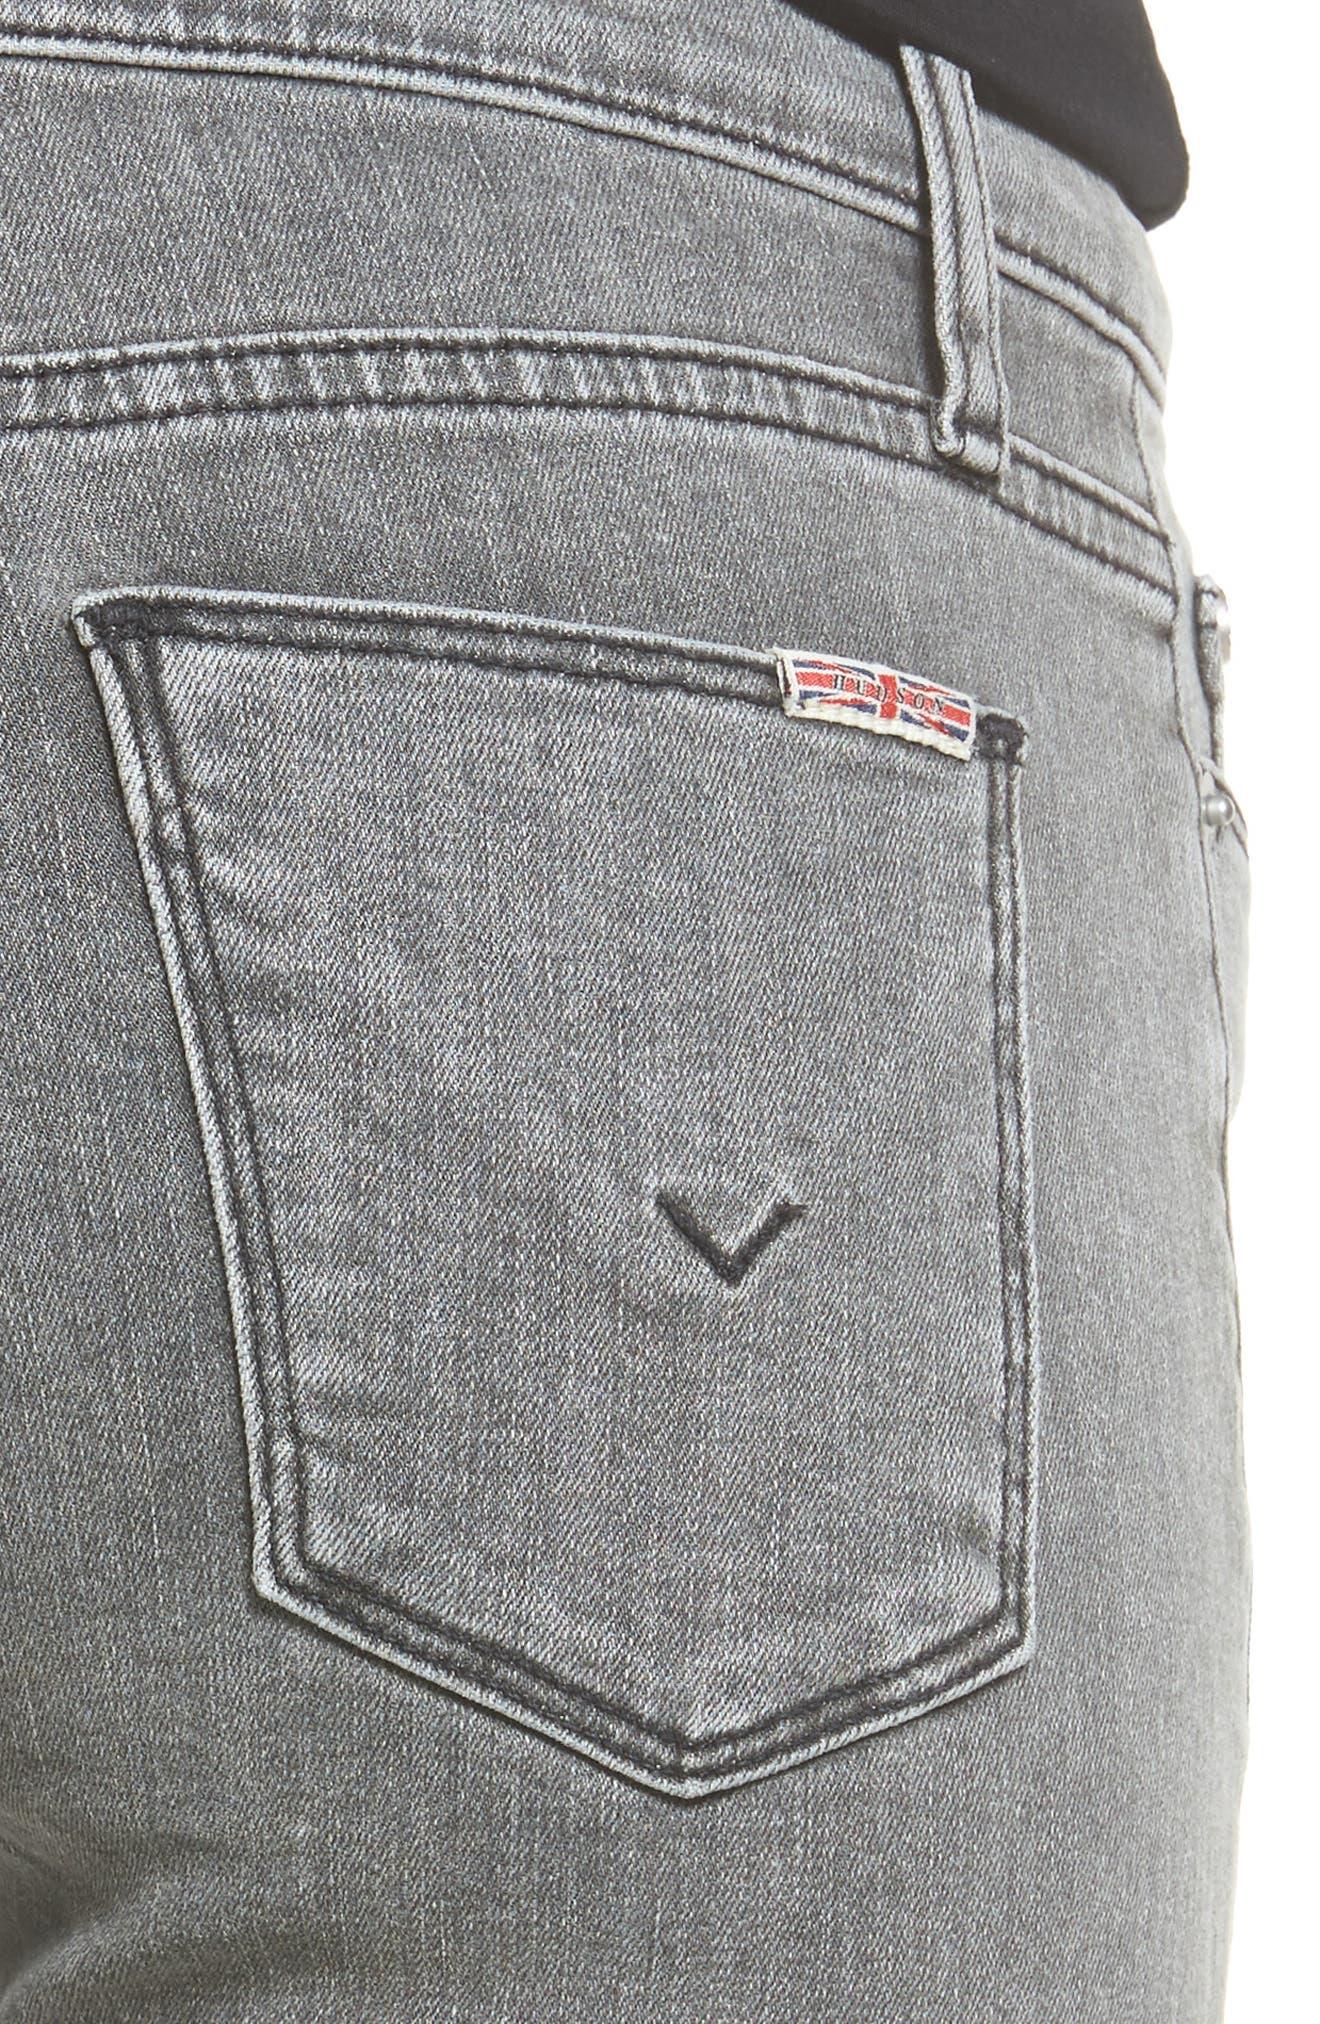 Hudson Nico Ankle Super Skinny Jeans,                             Alternate thumbnail 5, color,                             063